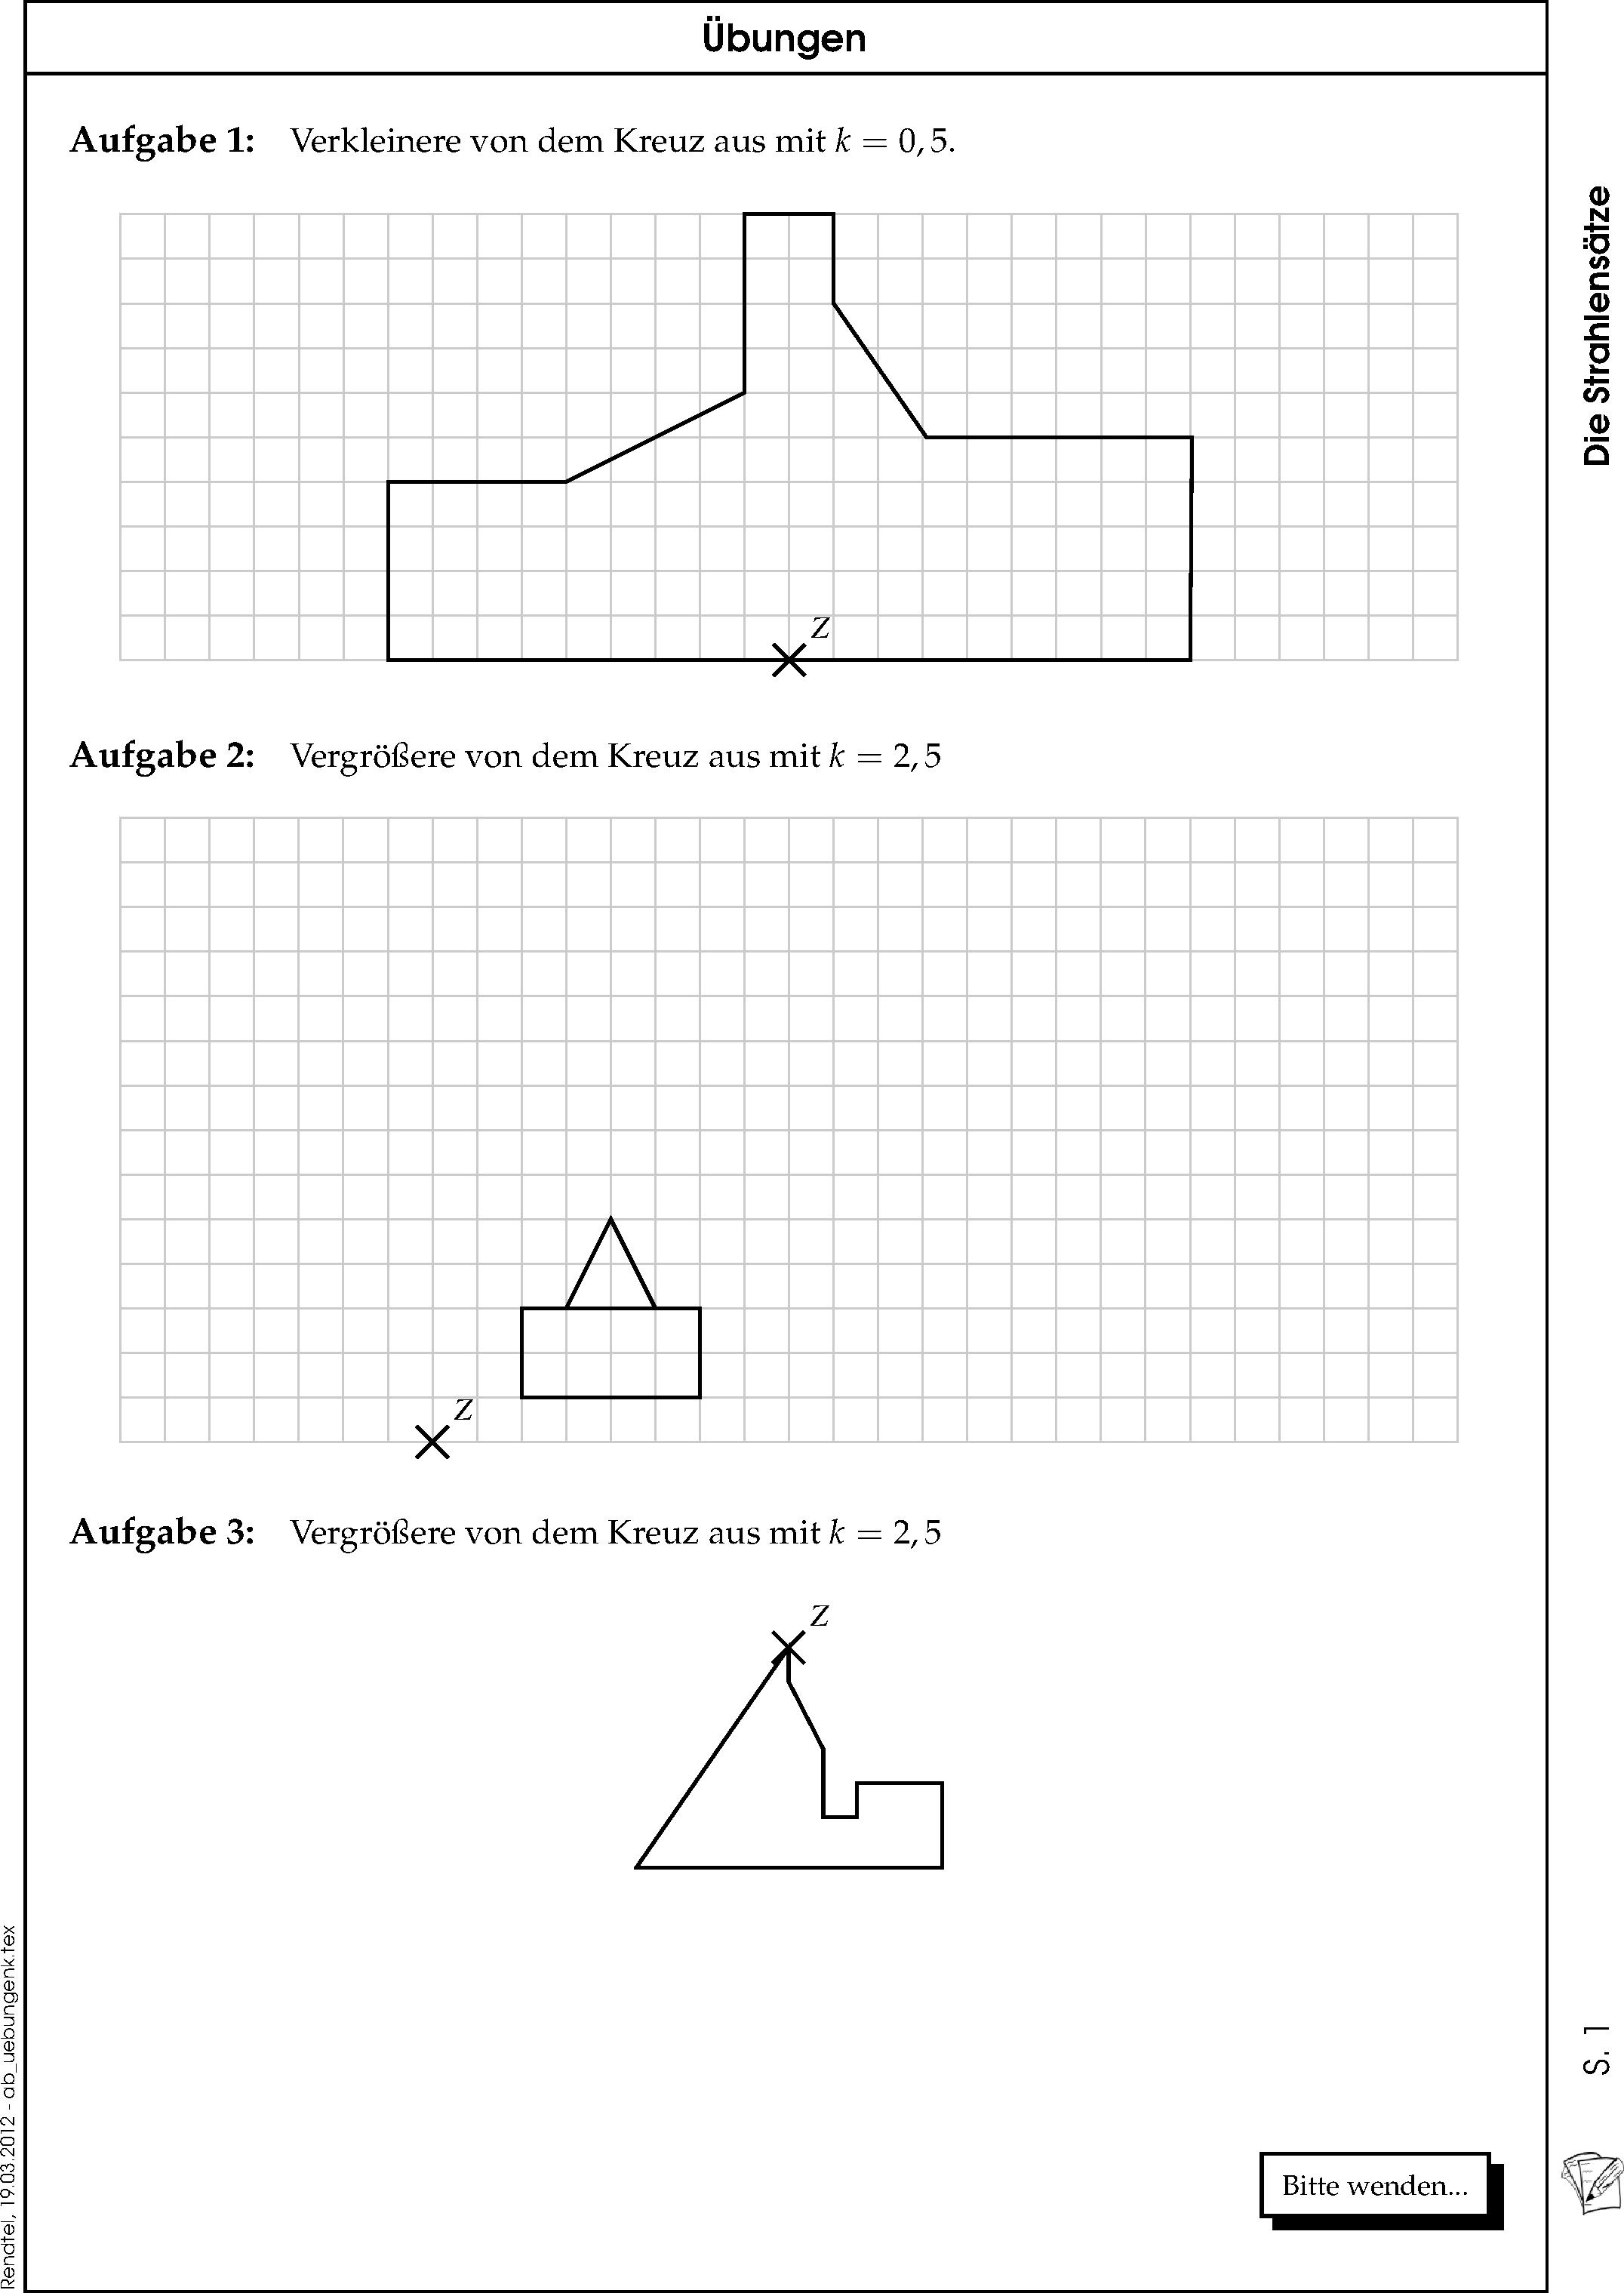 Großzügig K 1 Mathe Arbeitsblatt Zeitgenössisch - Übungen Mathe ...